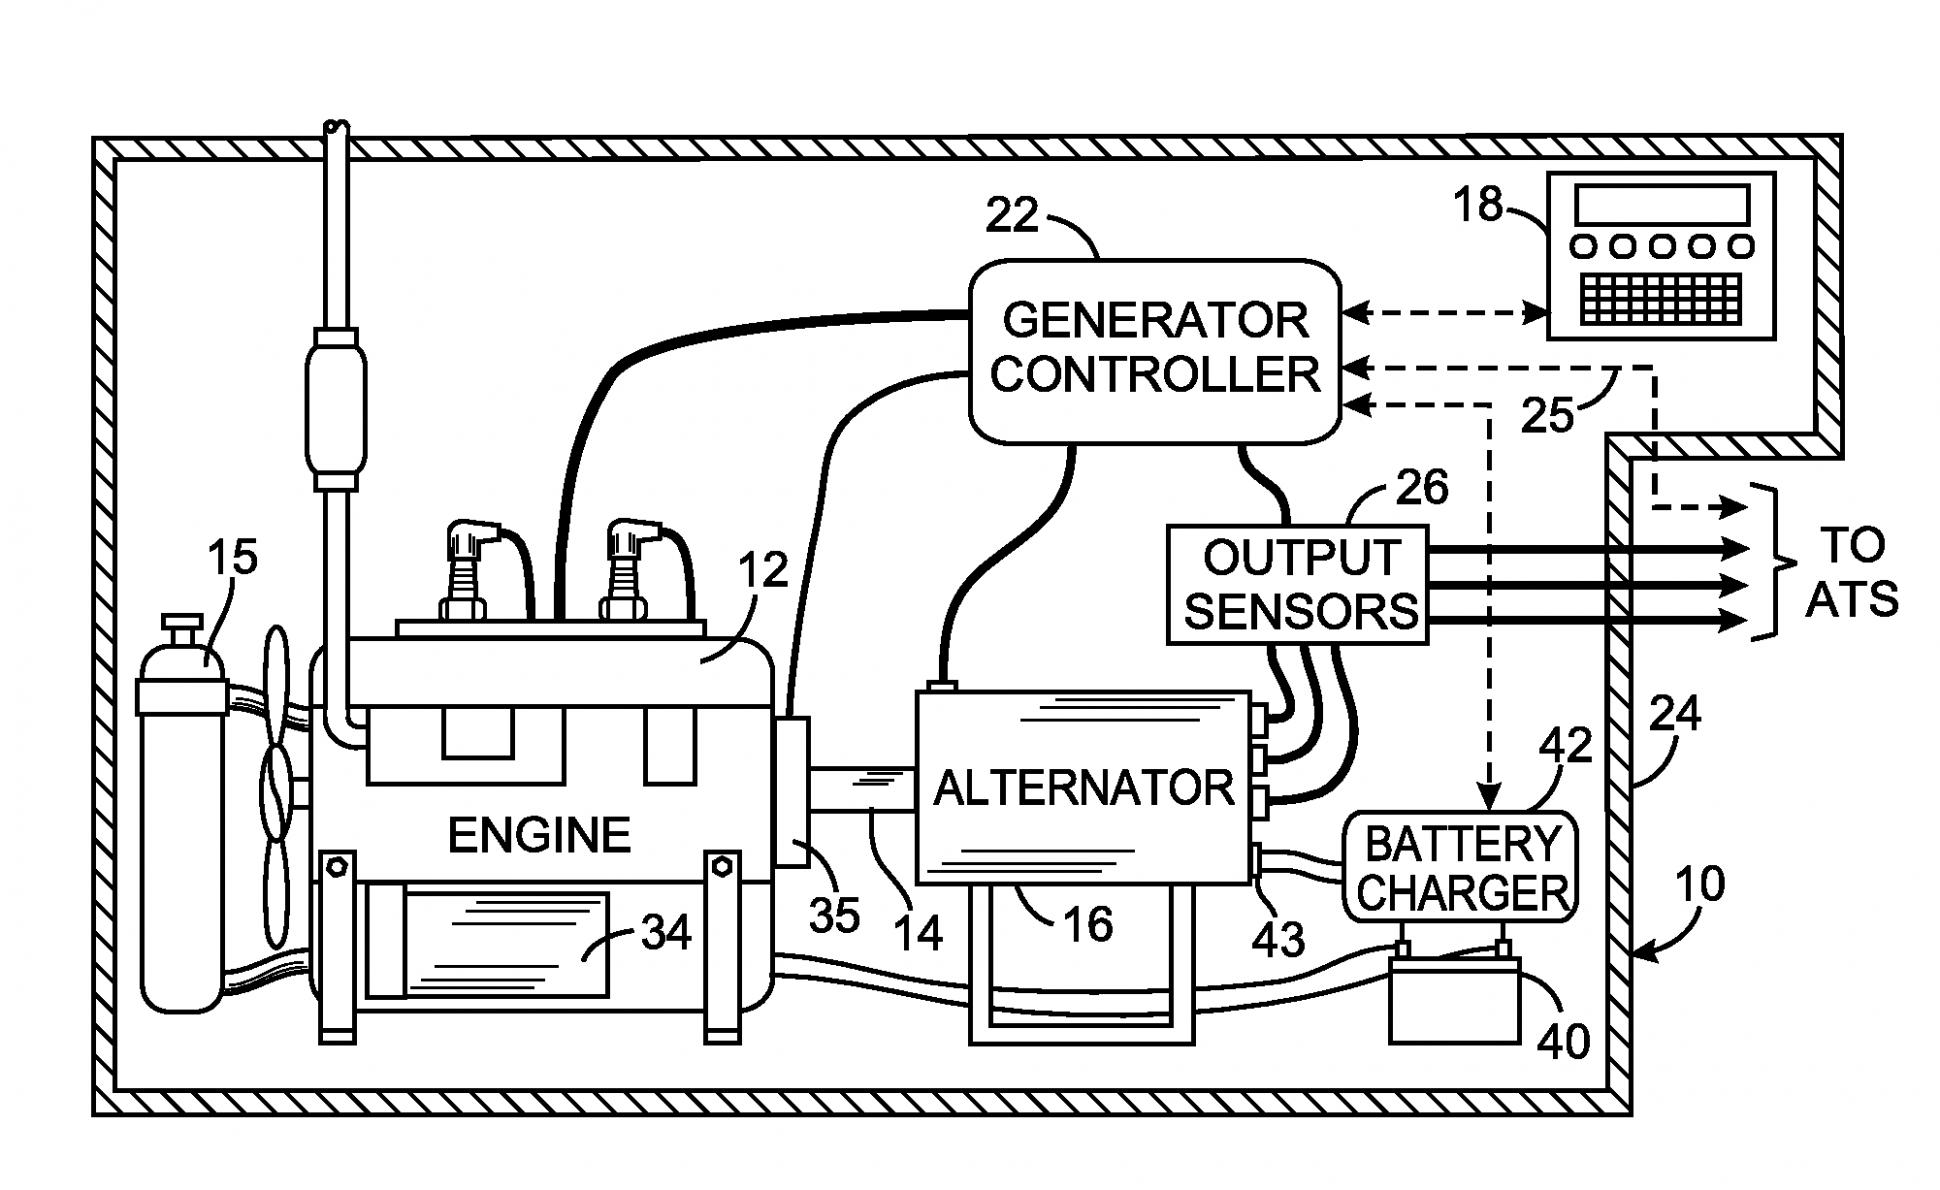 Engine Diagram Simple Generator di 2020